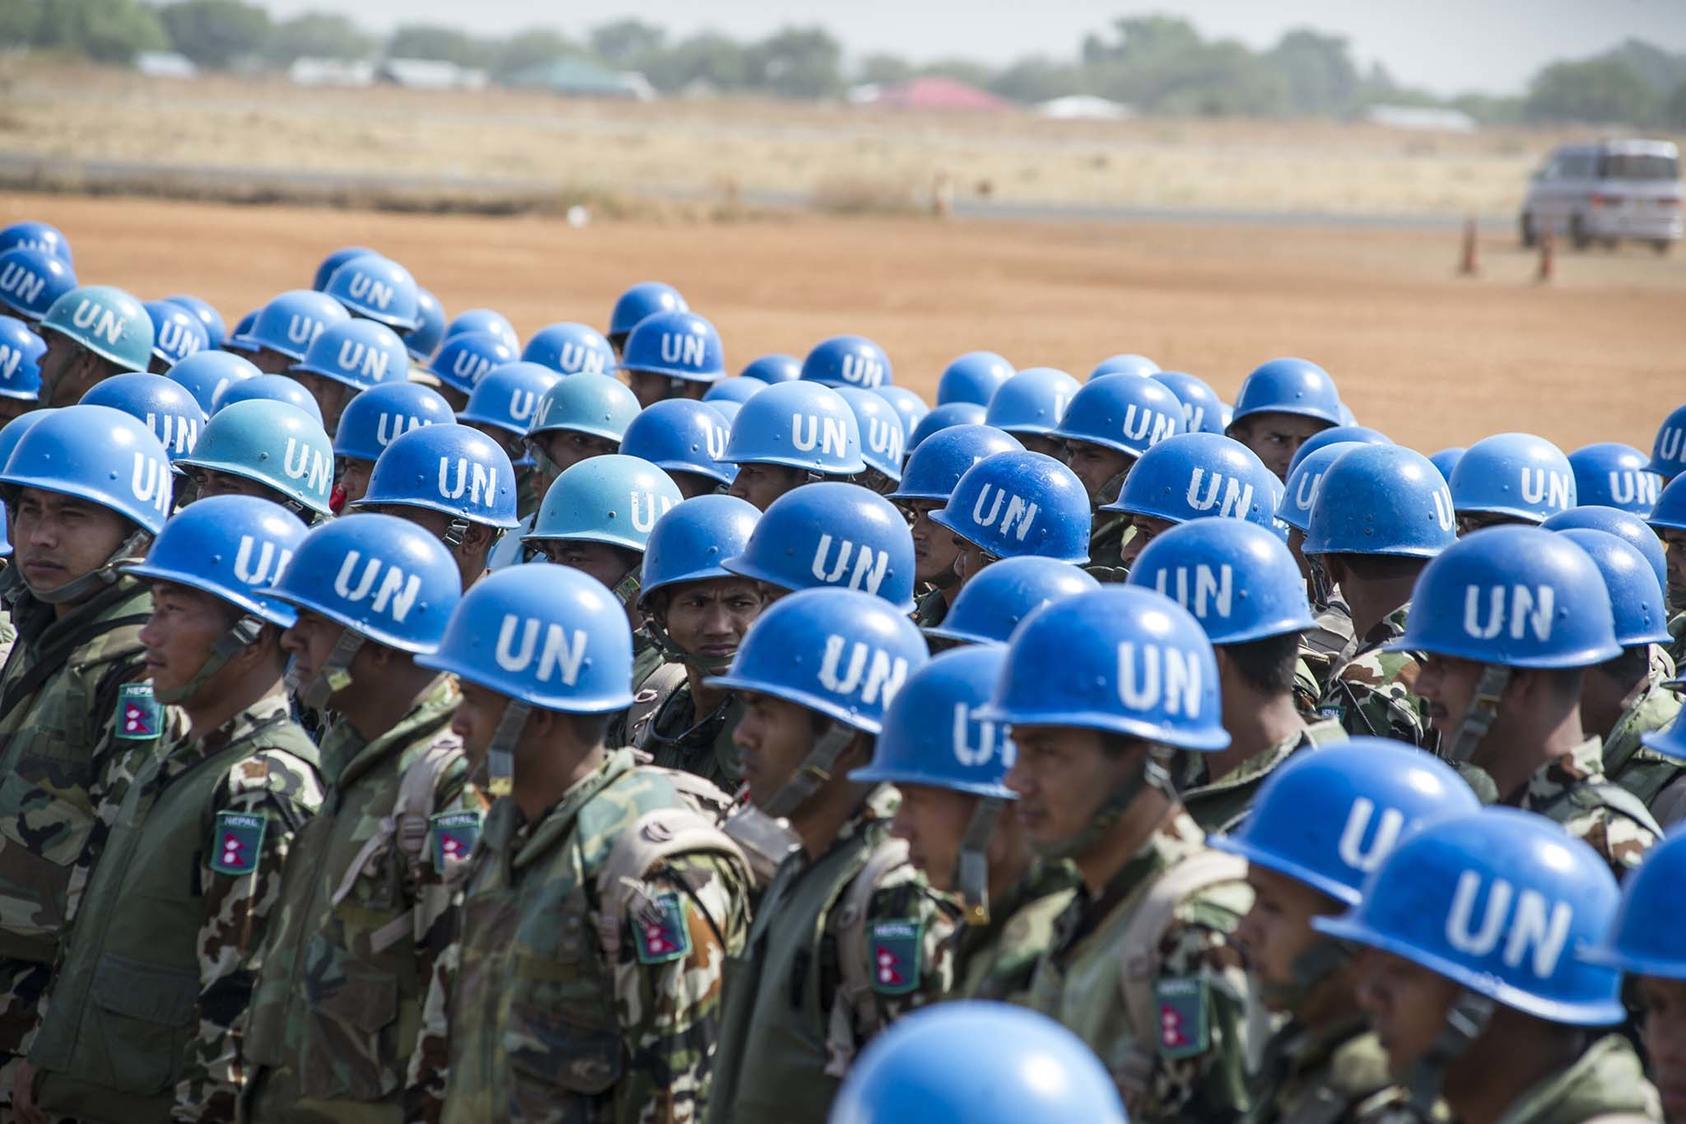 Sope wants UN Peacekeeping Training in Vanuatu